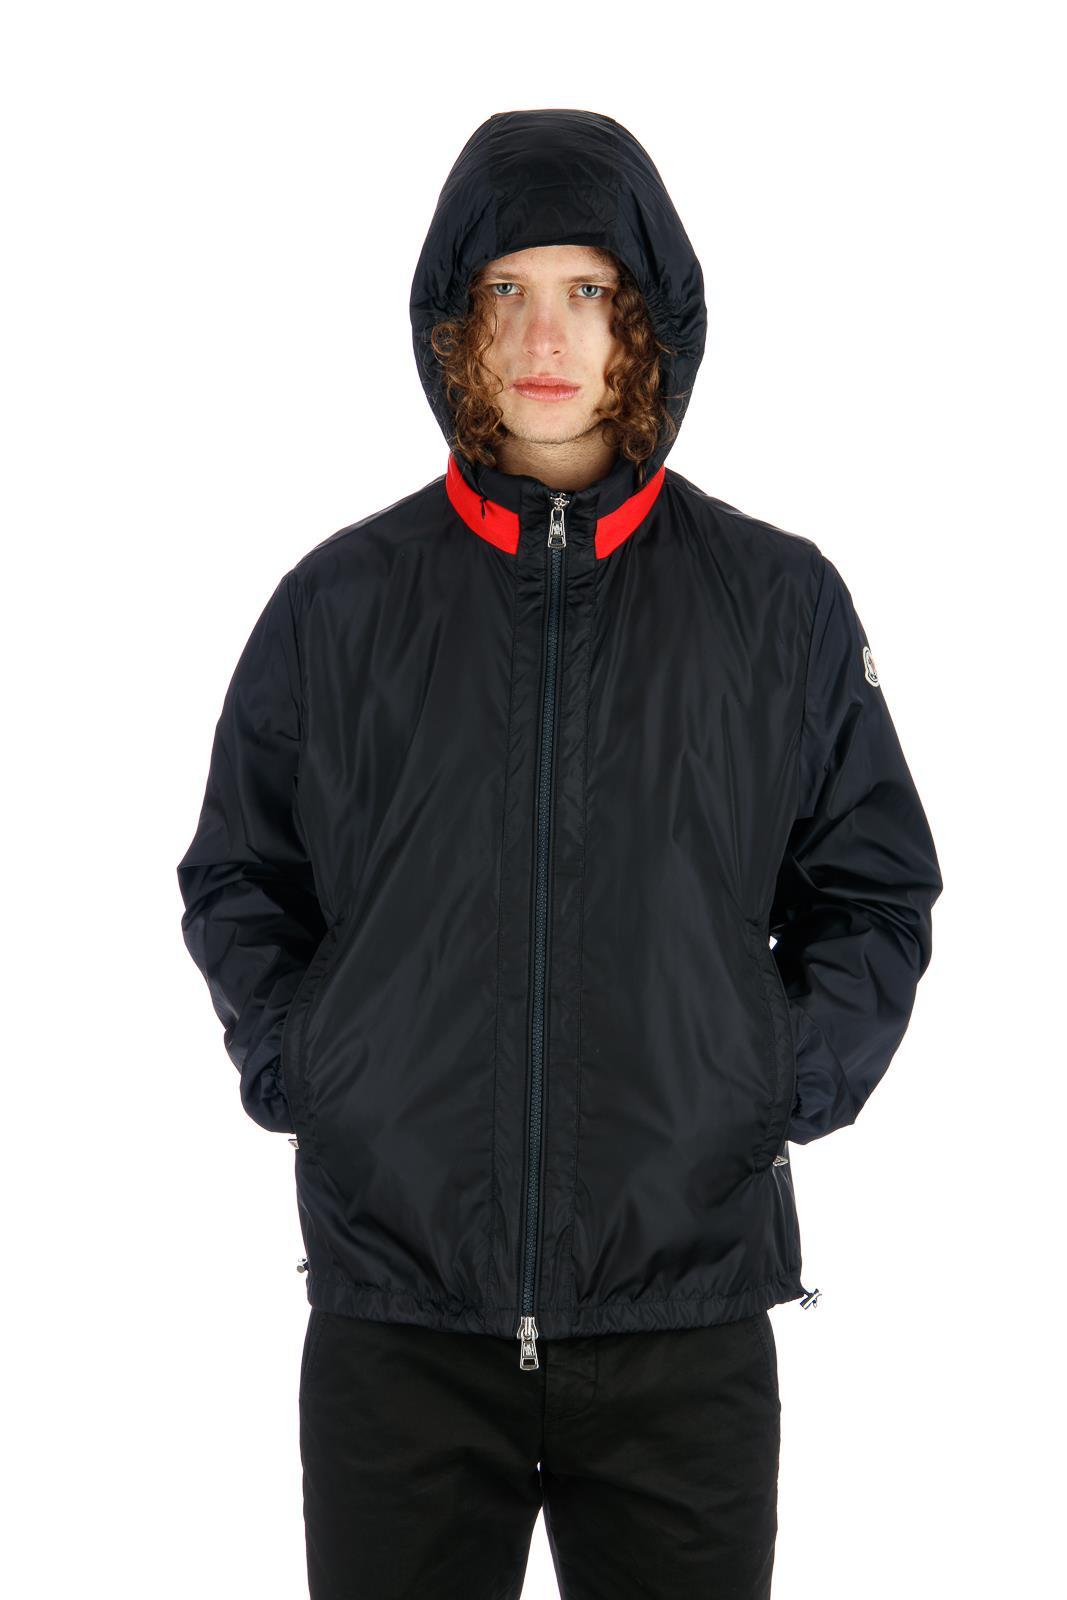 moncler jacket no hood